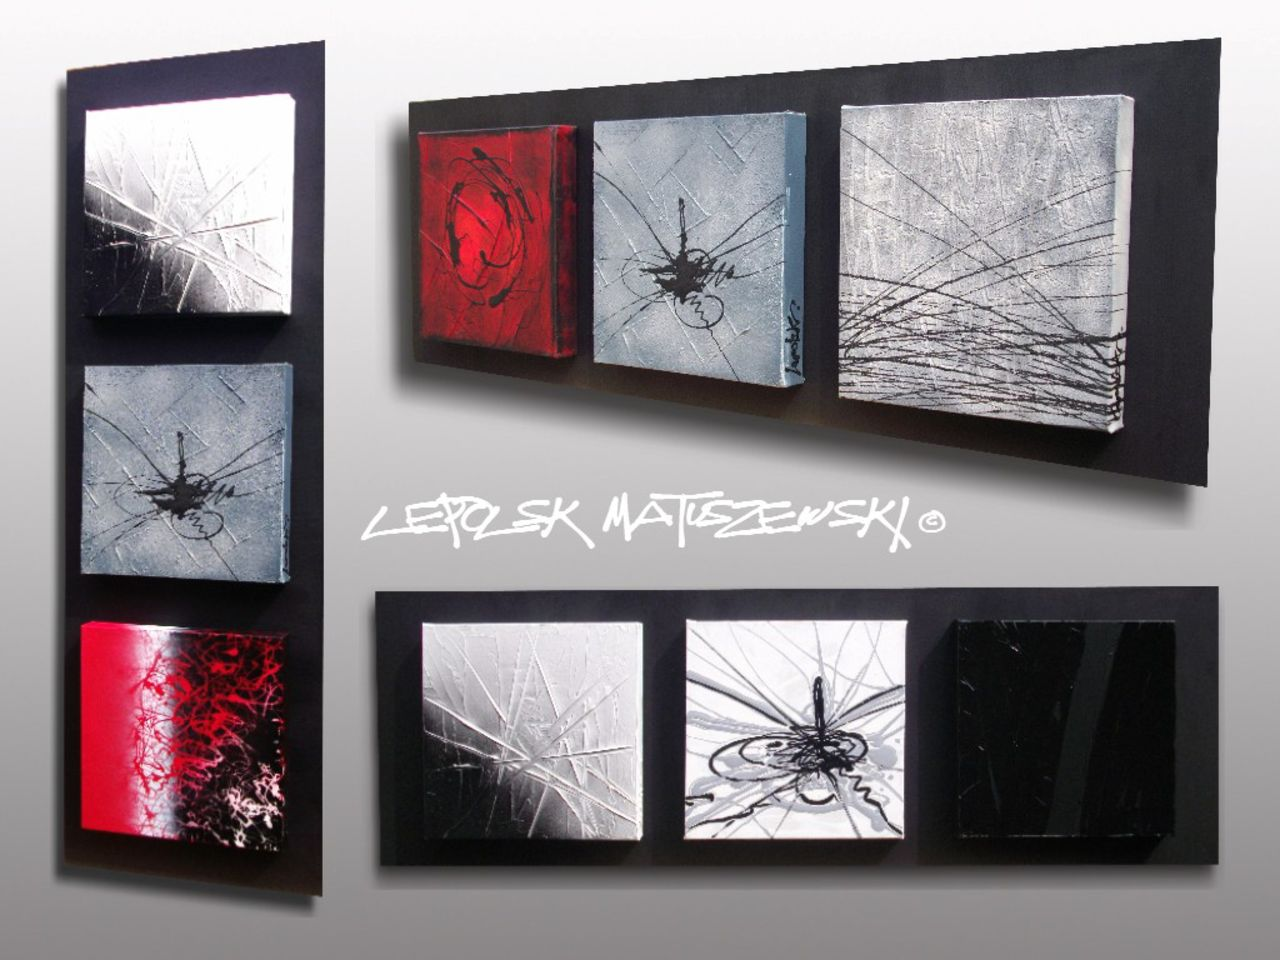 LEPOLSK MATUSZEWSKI Abstrait petis formats Lepolsk Matuszewski expressionnisme abstrait, artiste peintre plasticien